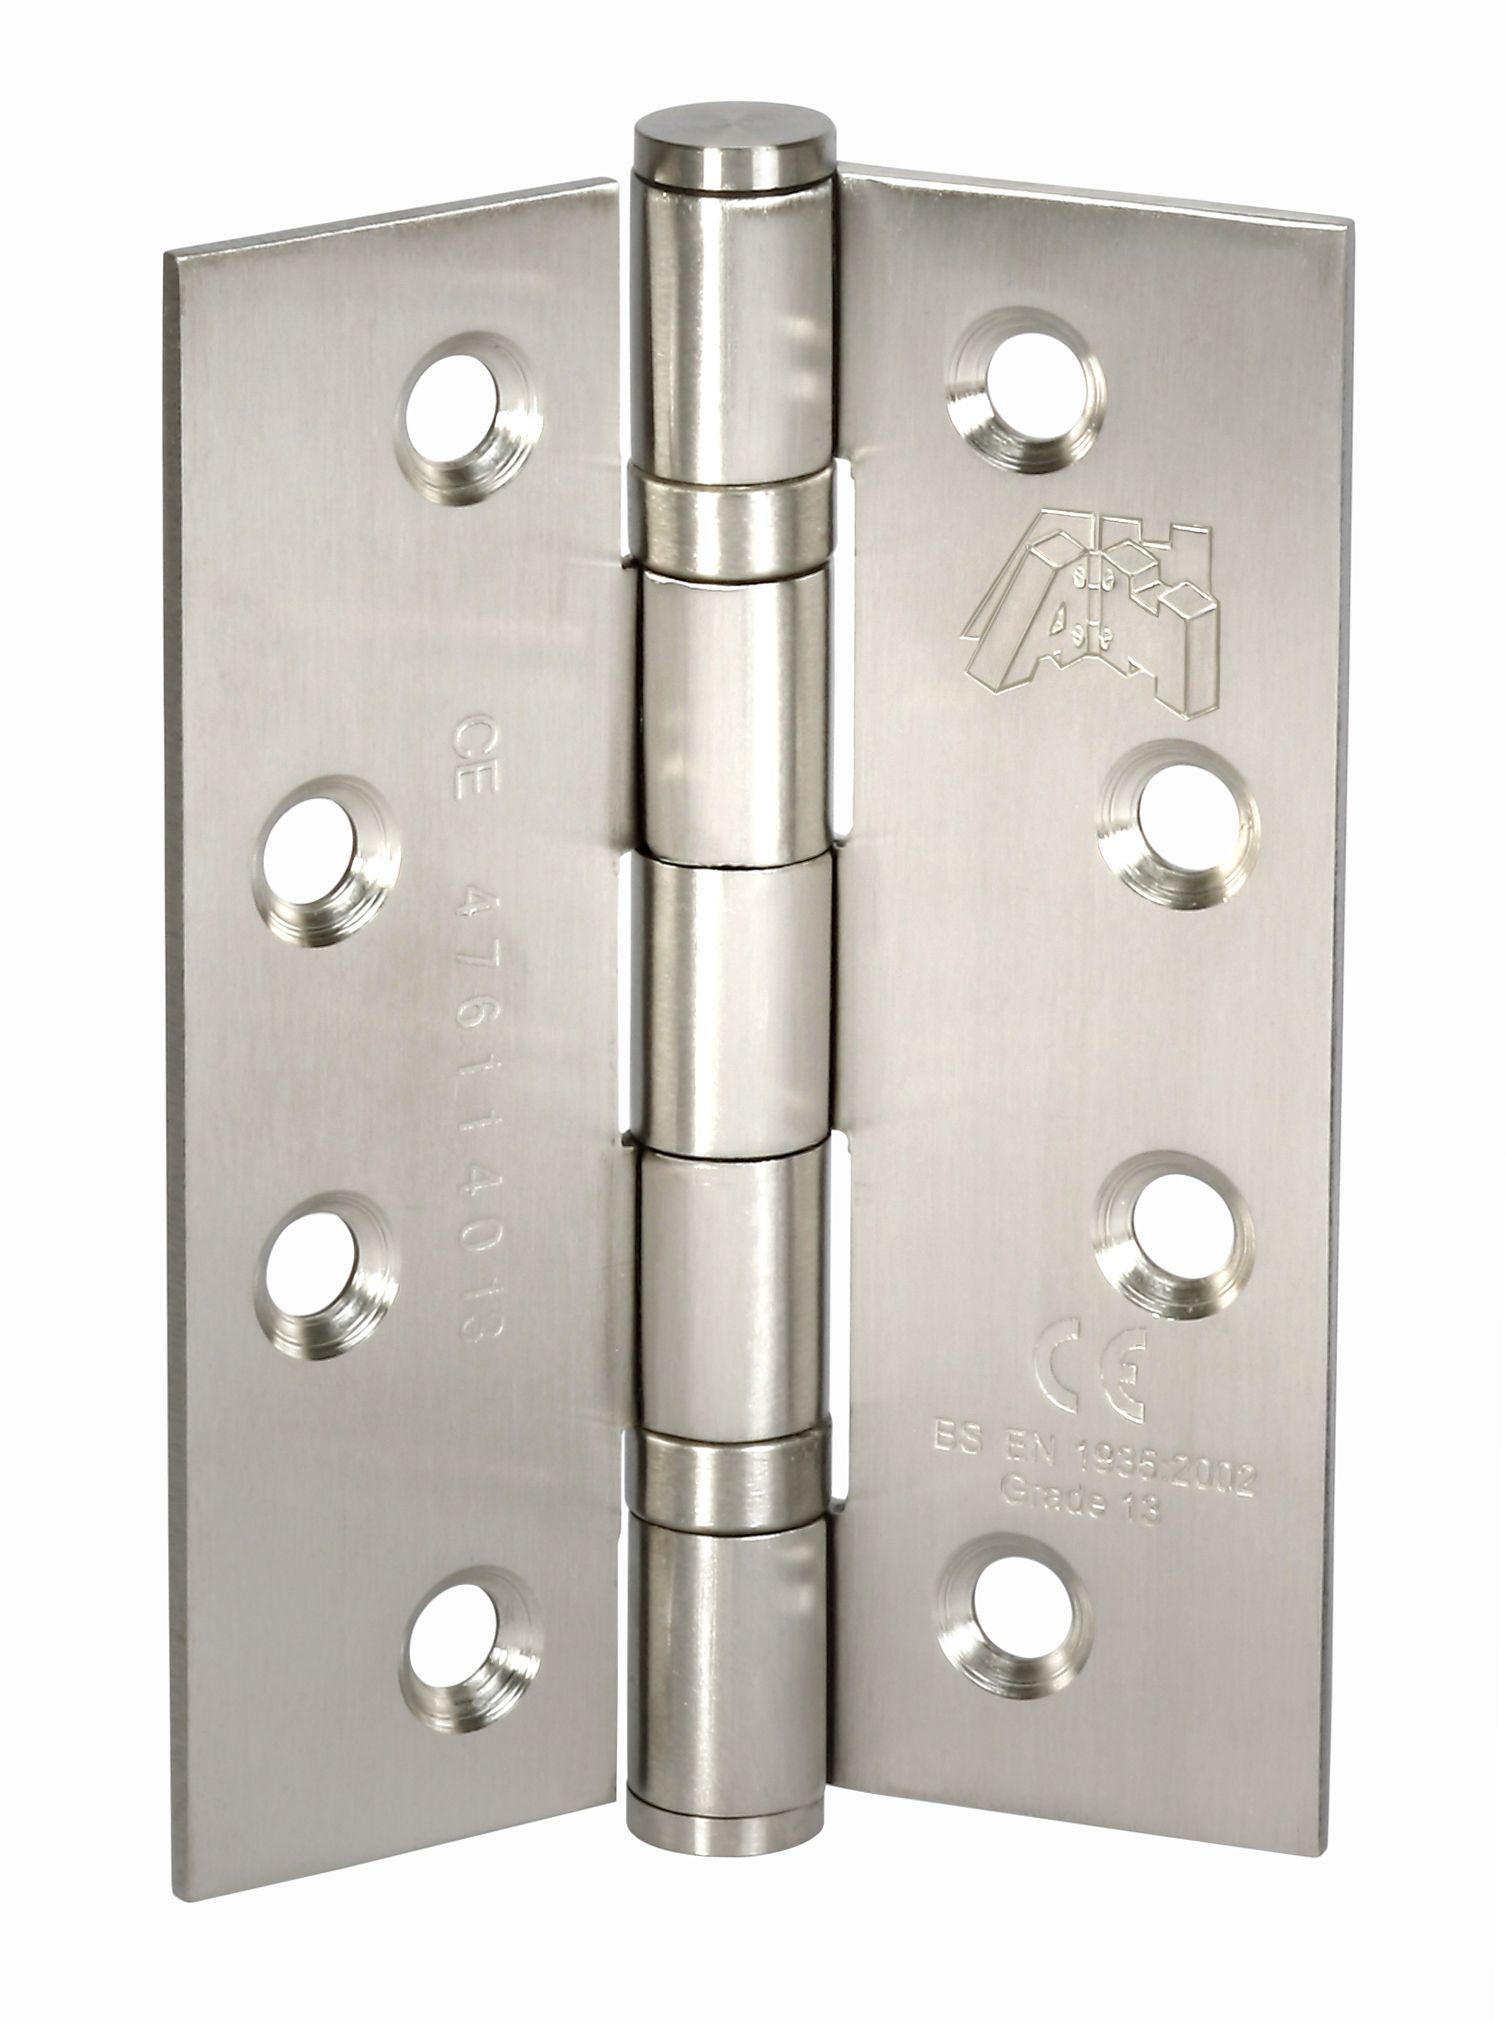 100mm Stainless Steel Front Door Hinge Pairs Ce Stamped H401 Hardware Stainless Steel Hinges Door Hinges